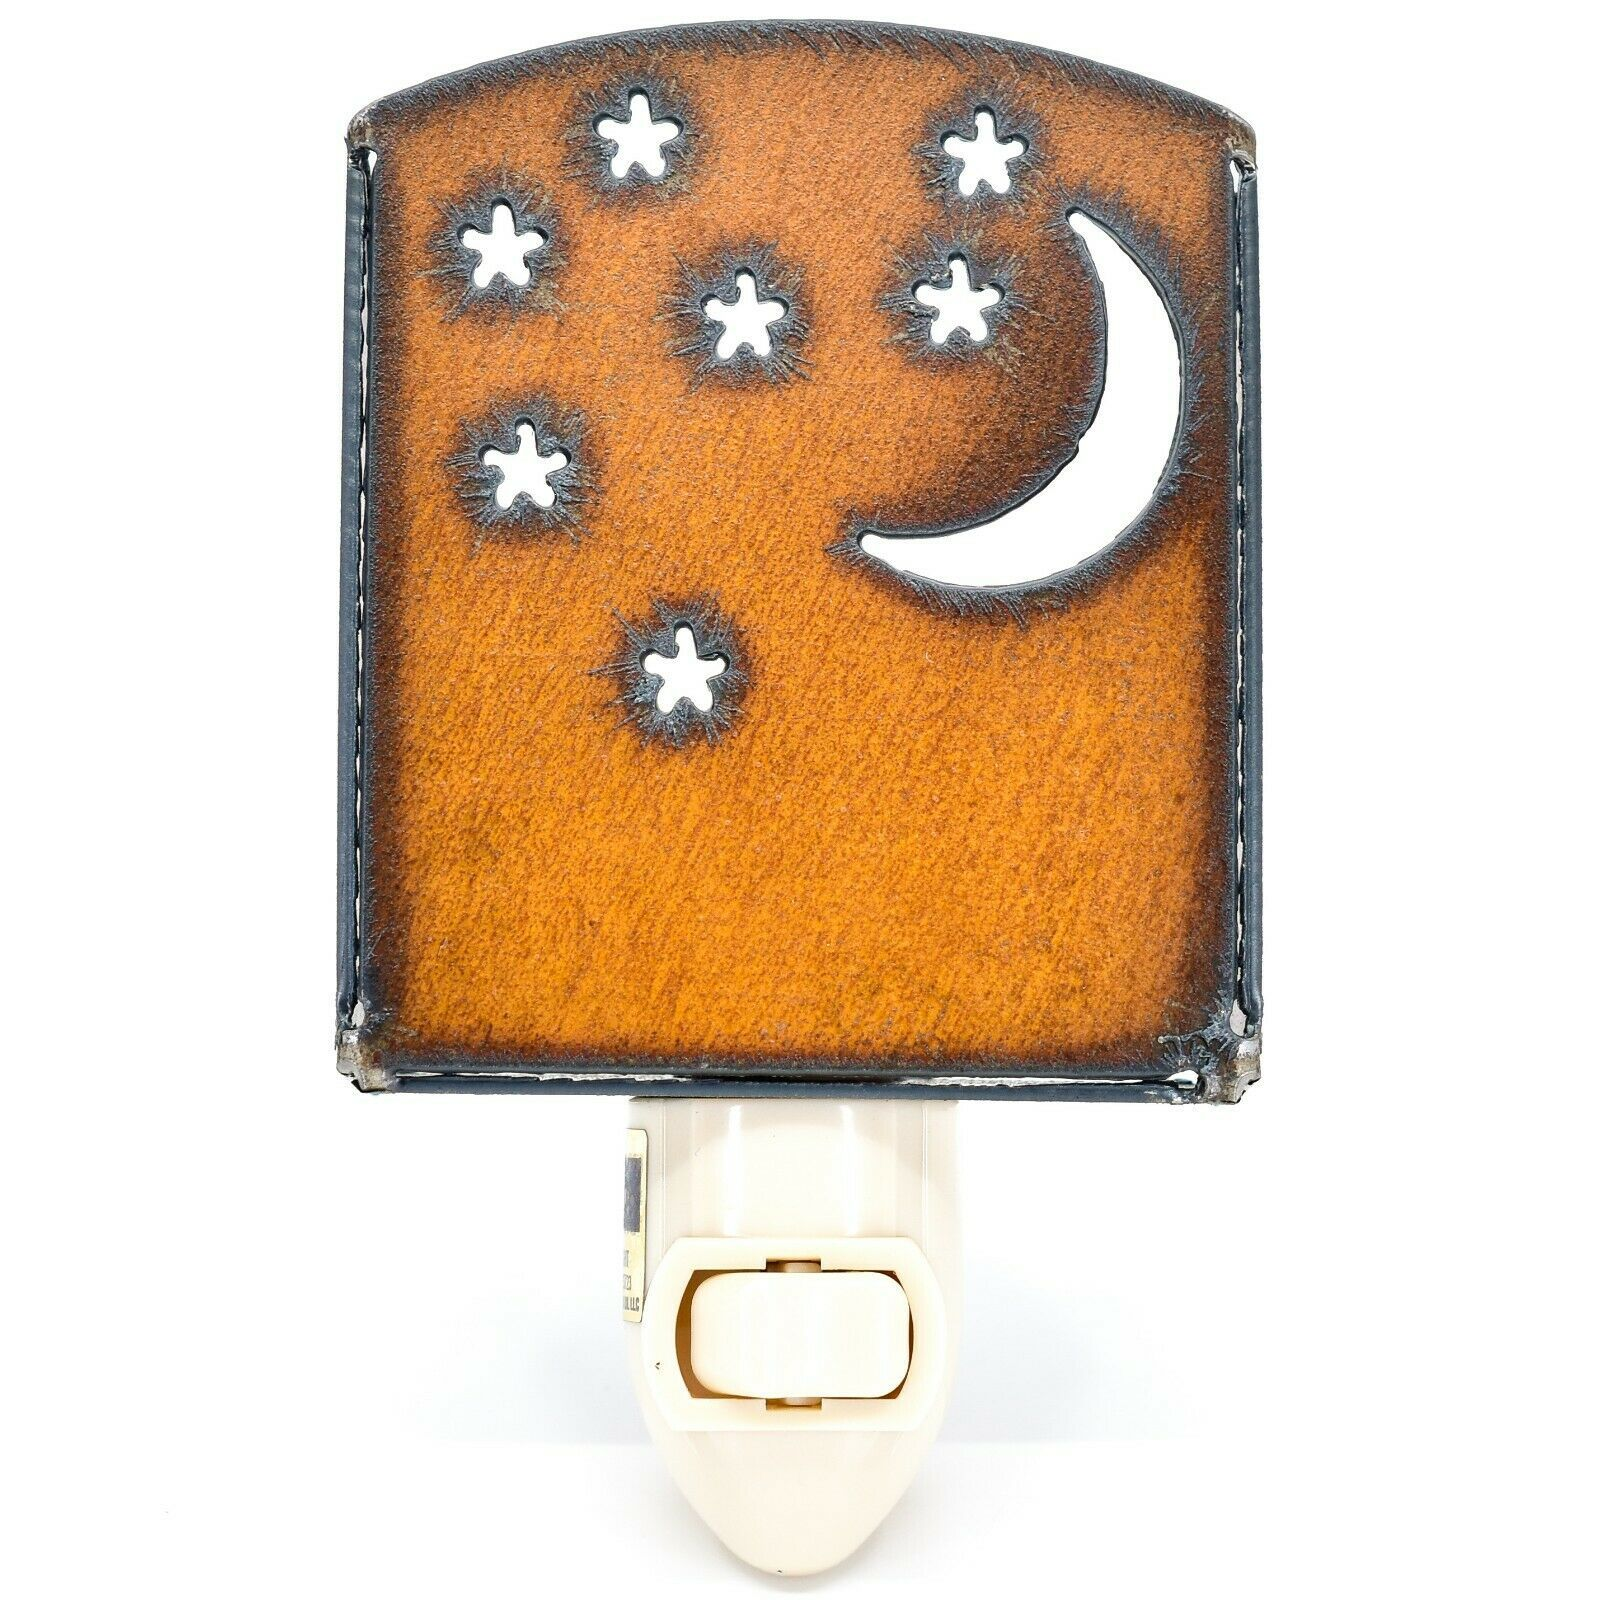 Country Western Rusted Patina Iron Metal Cutout Moon Stars Nightlight Light